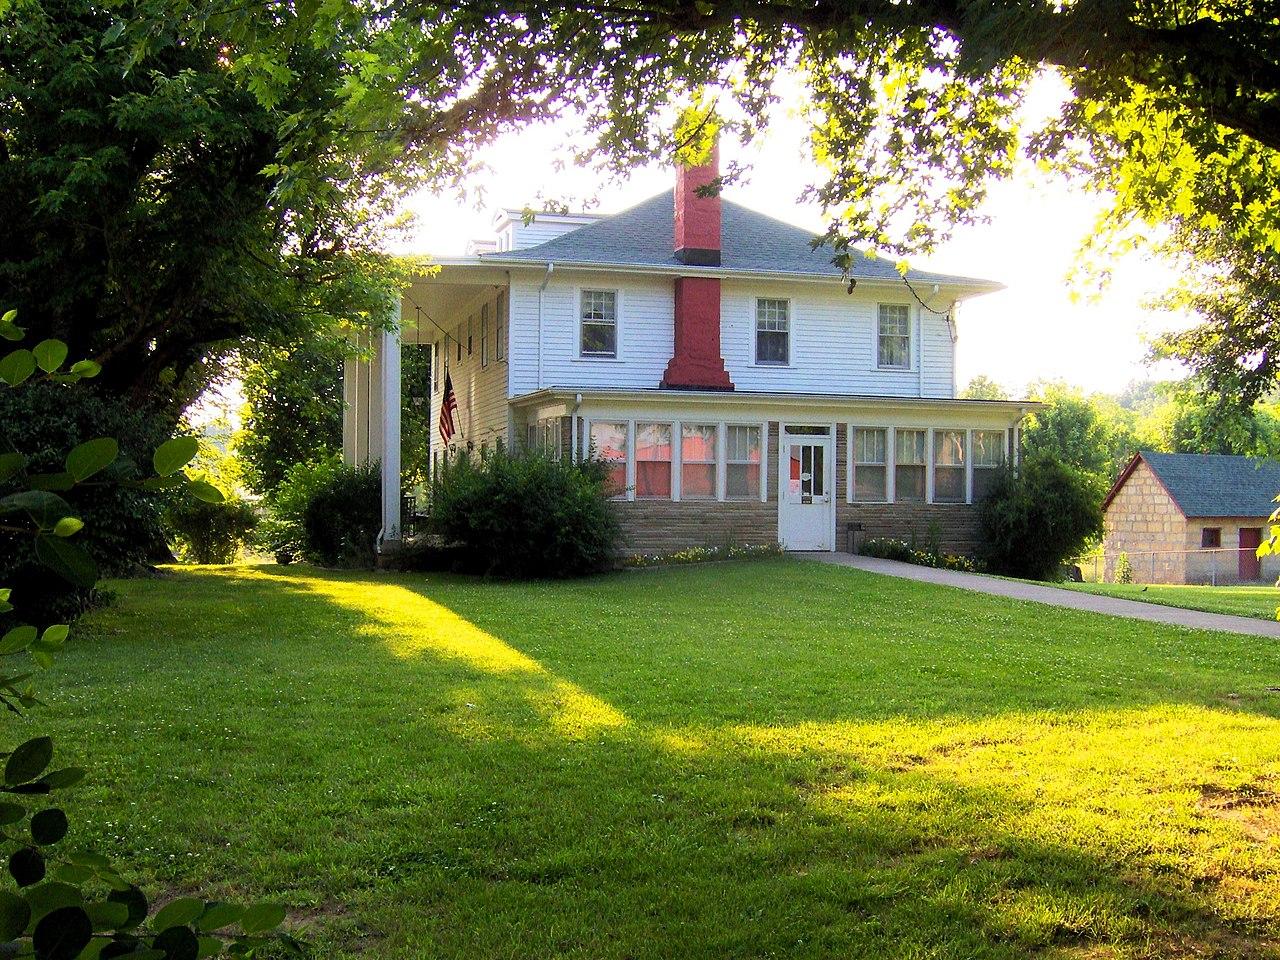 Sgt. Alvin C. York's Home